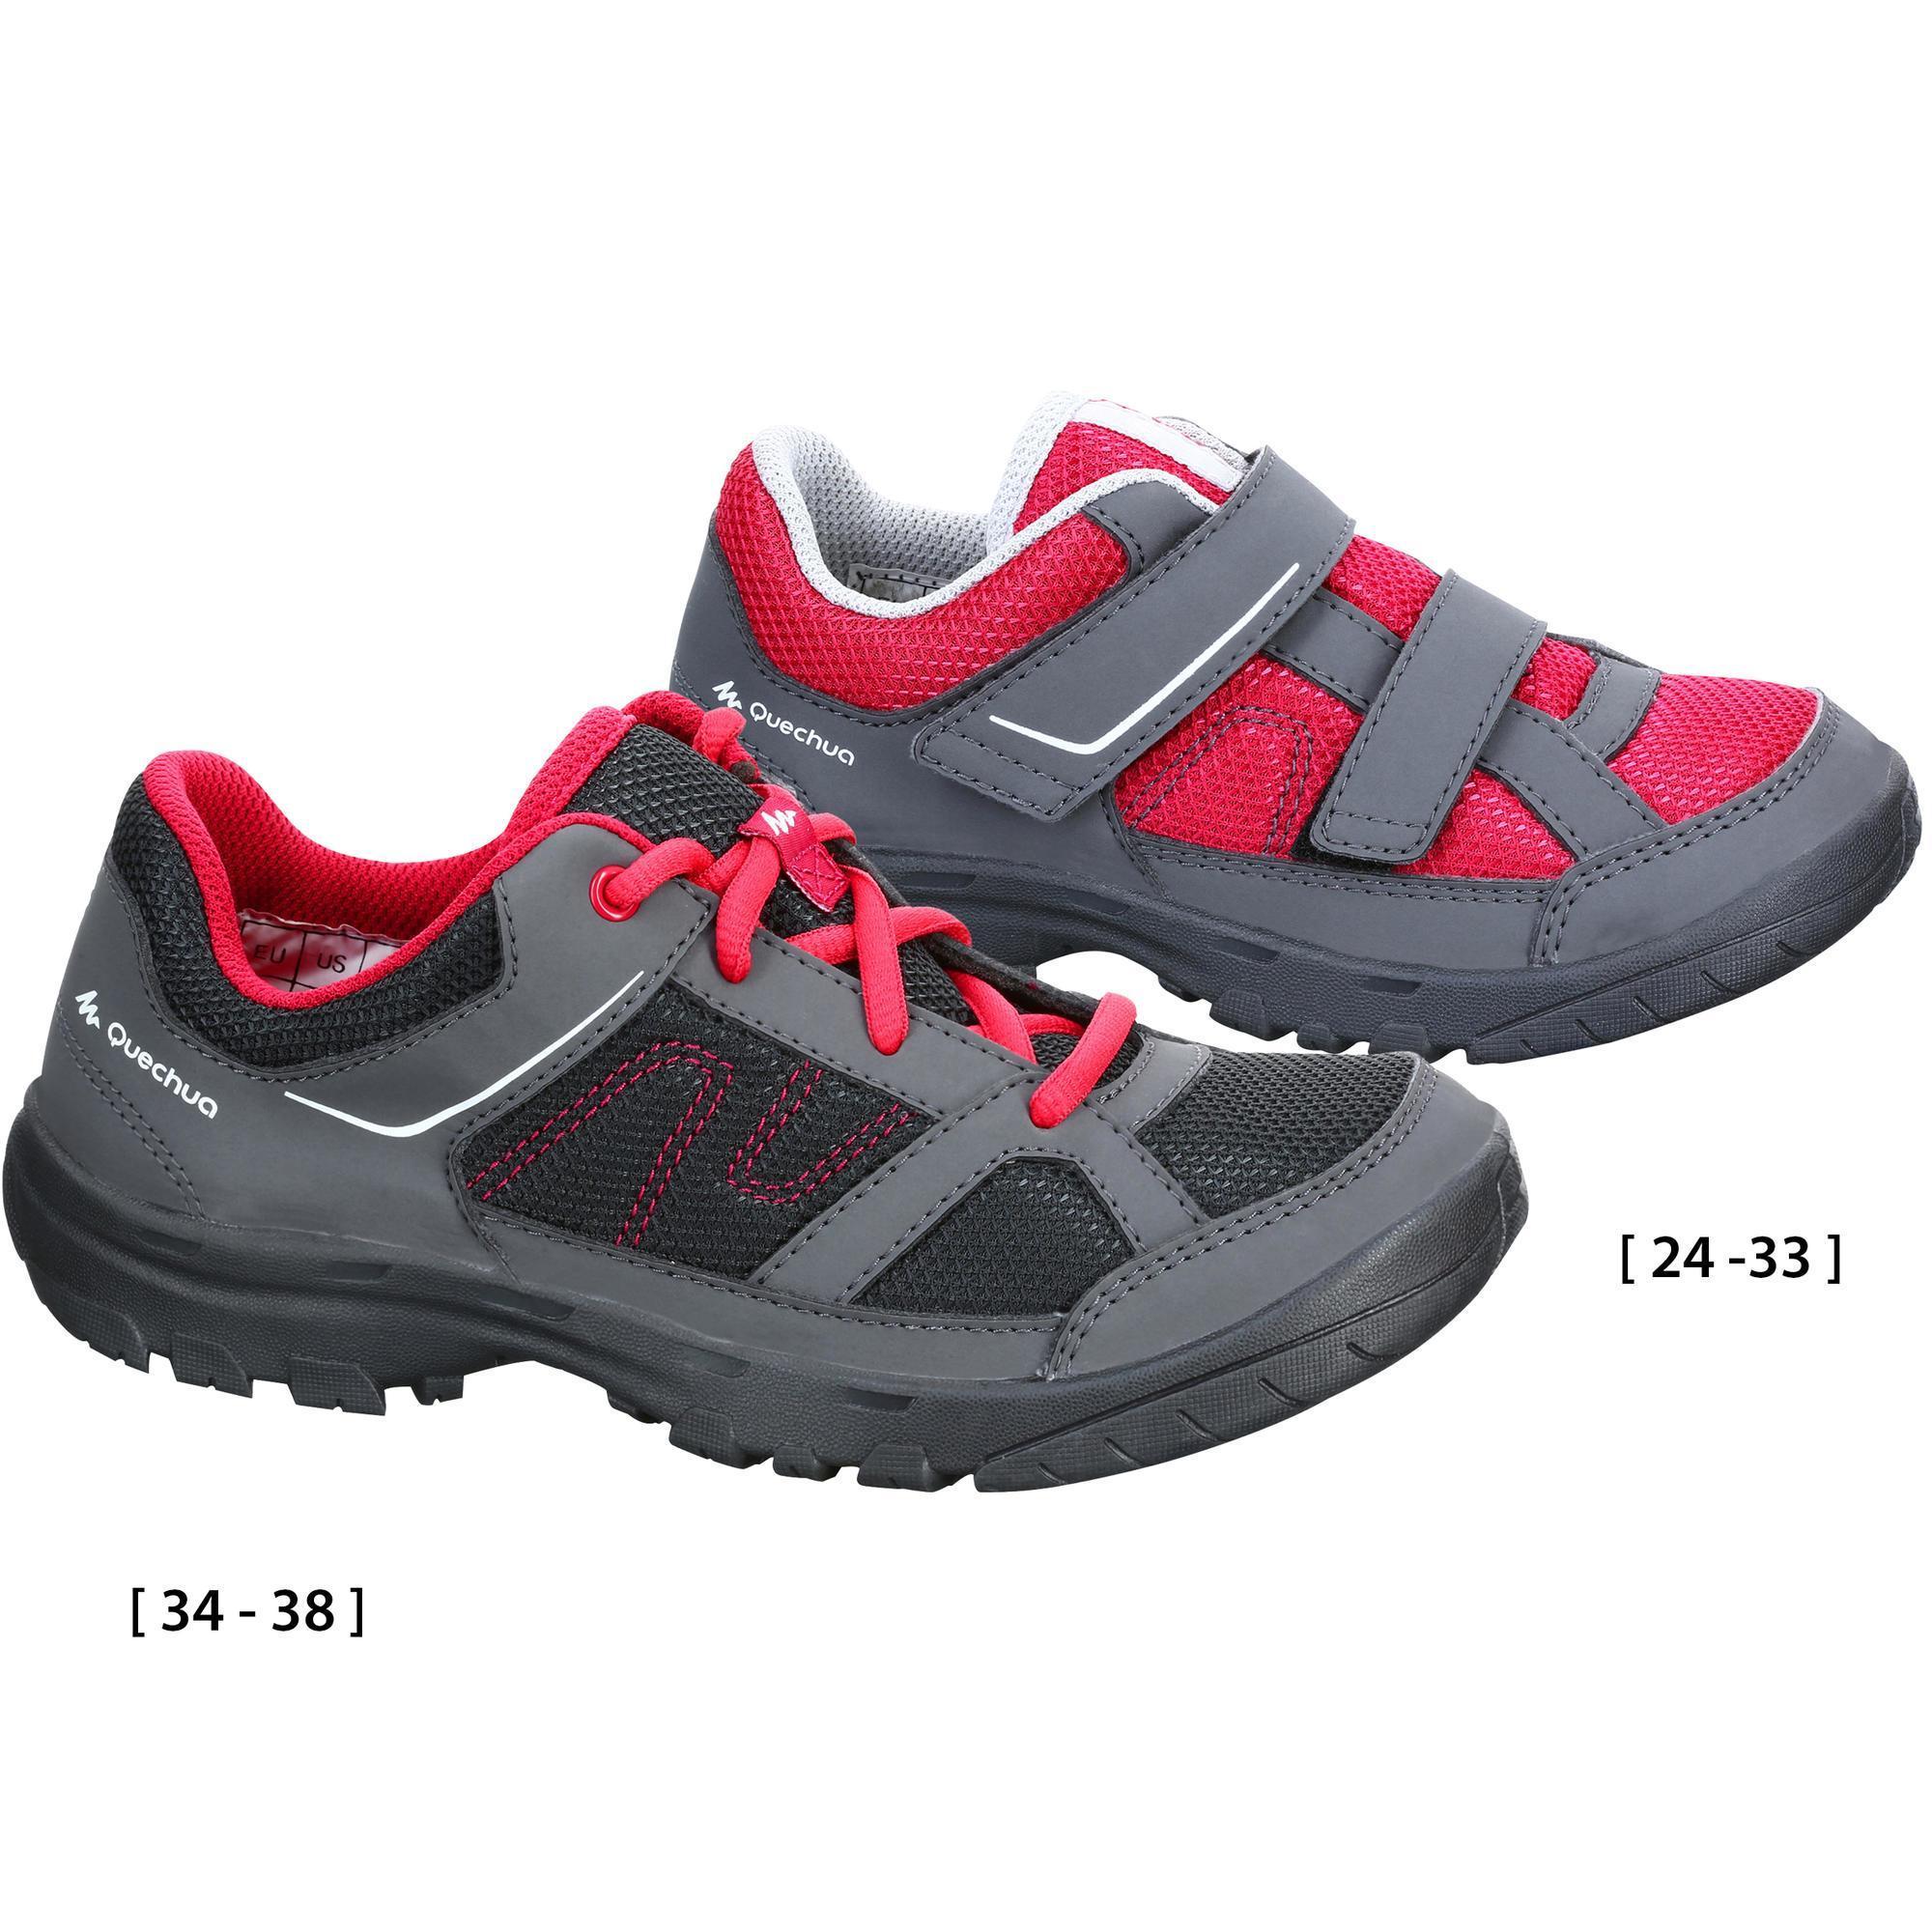 Girl's Hiking Shoes | Waterproof